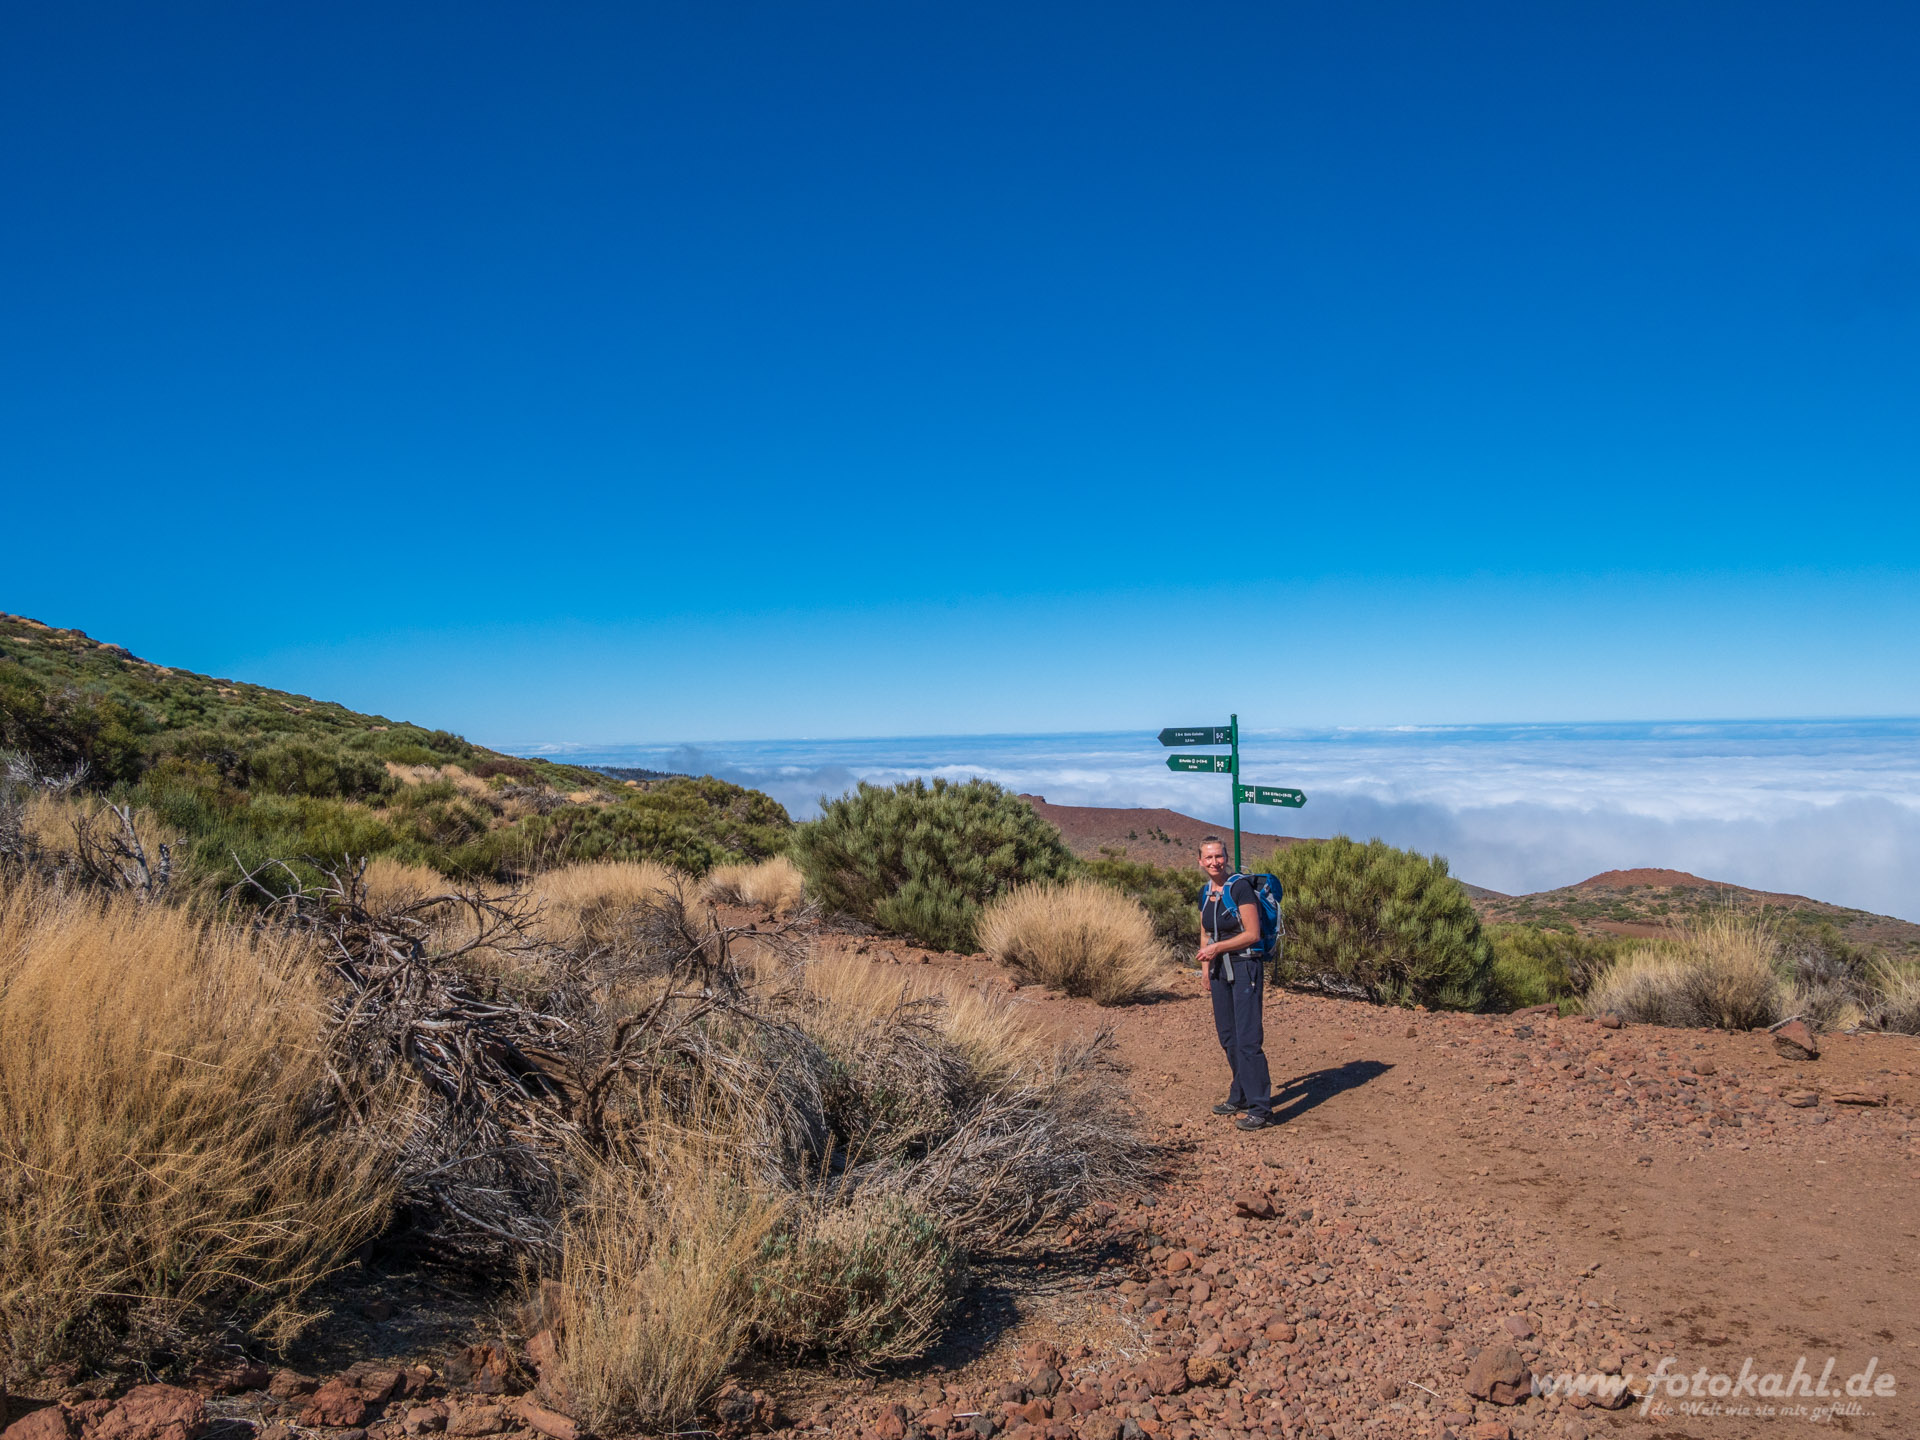 Teneriffa - Wandern im Nationalpark.